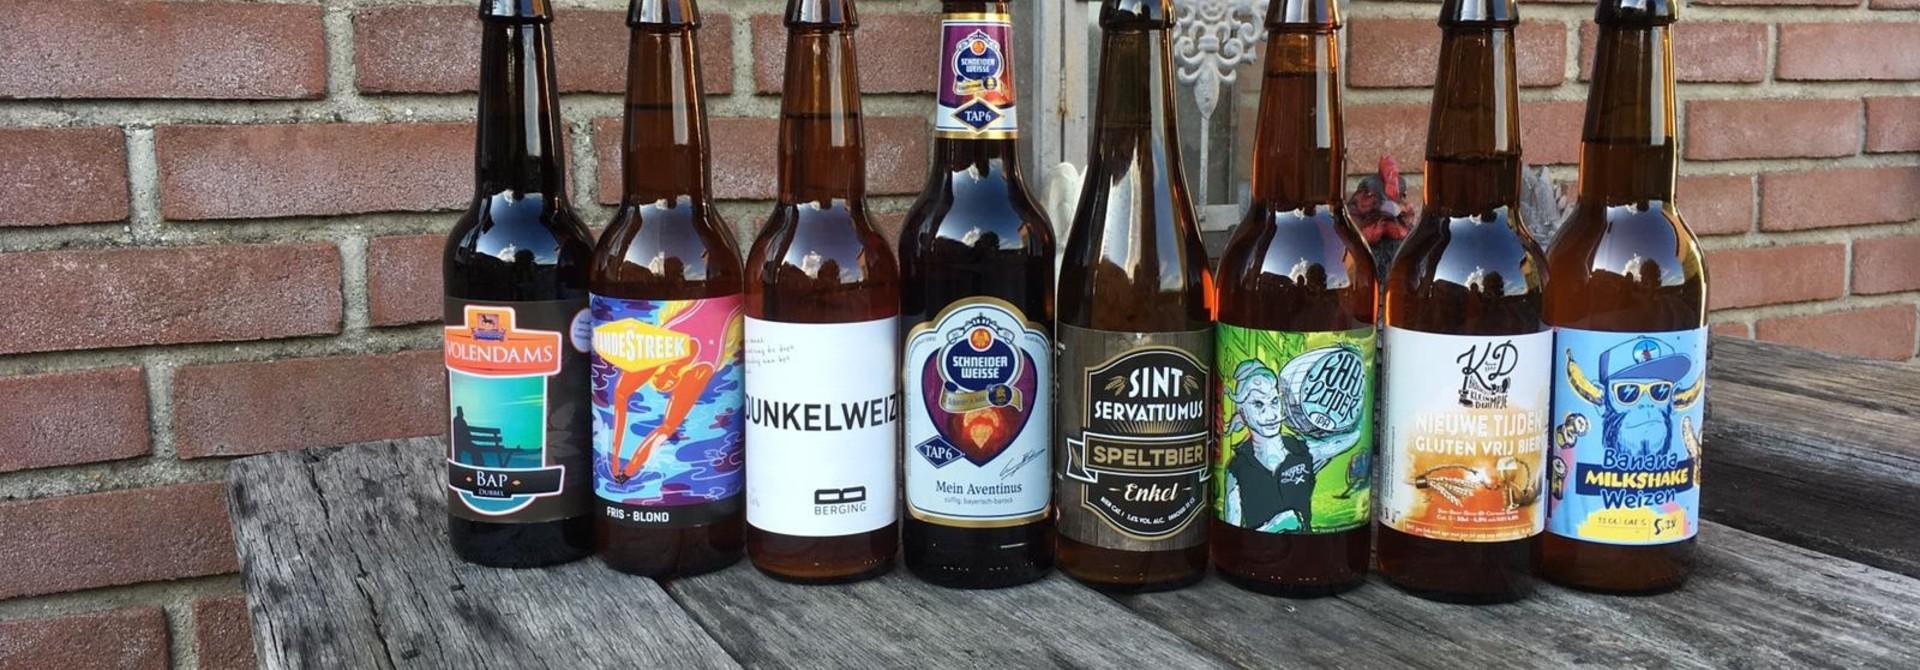 Speciaalbier – bierpakket september 2019